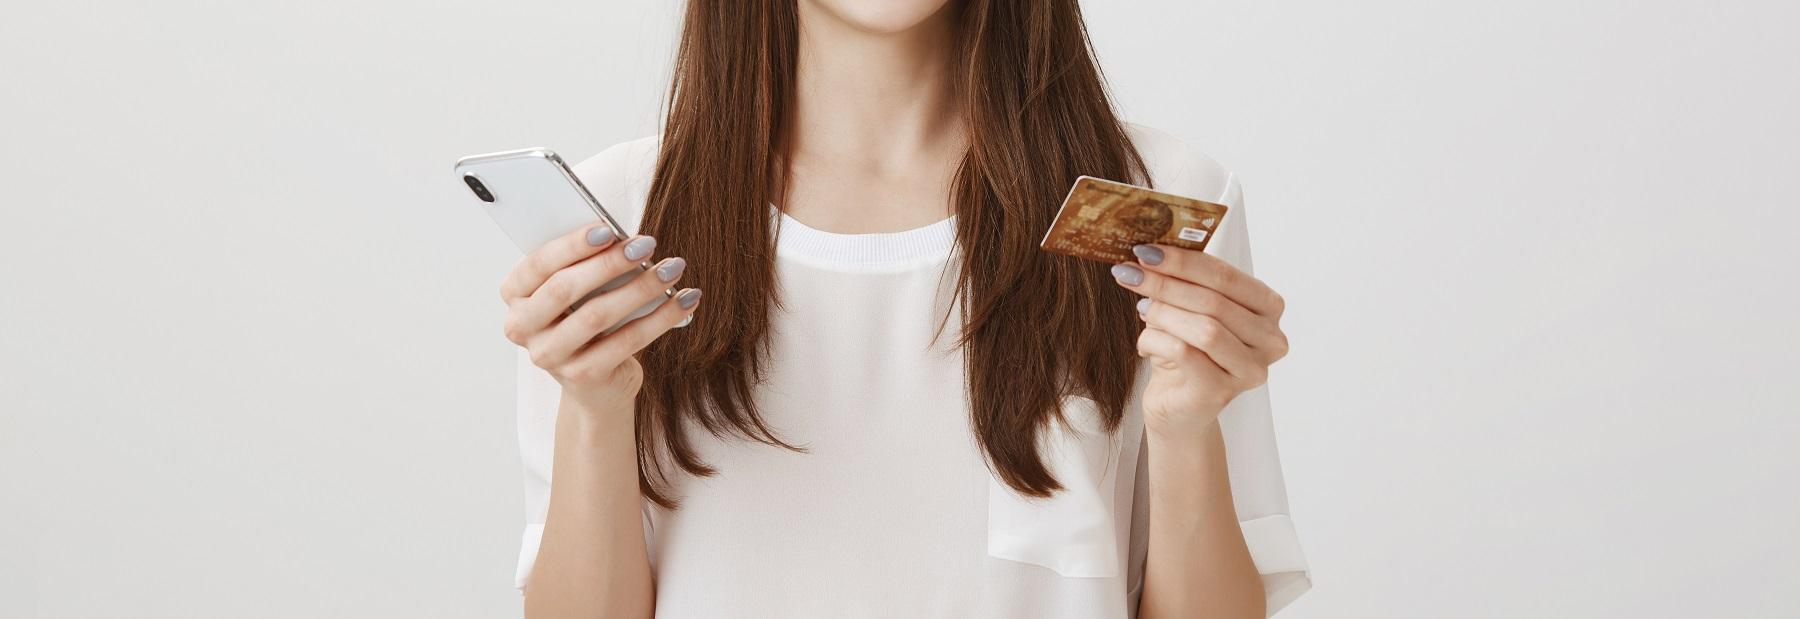 Carte Gold FLOA Bank : commandez-la en ligne !